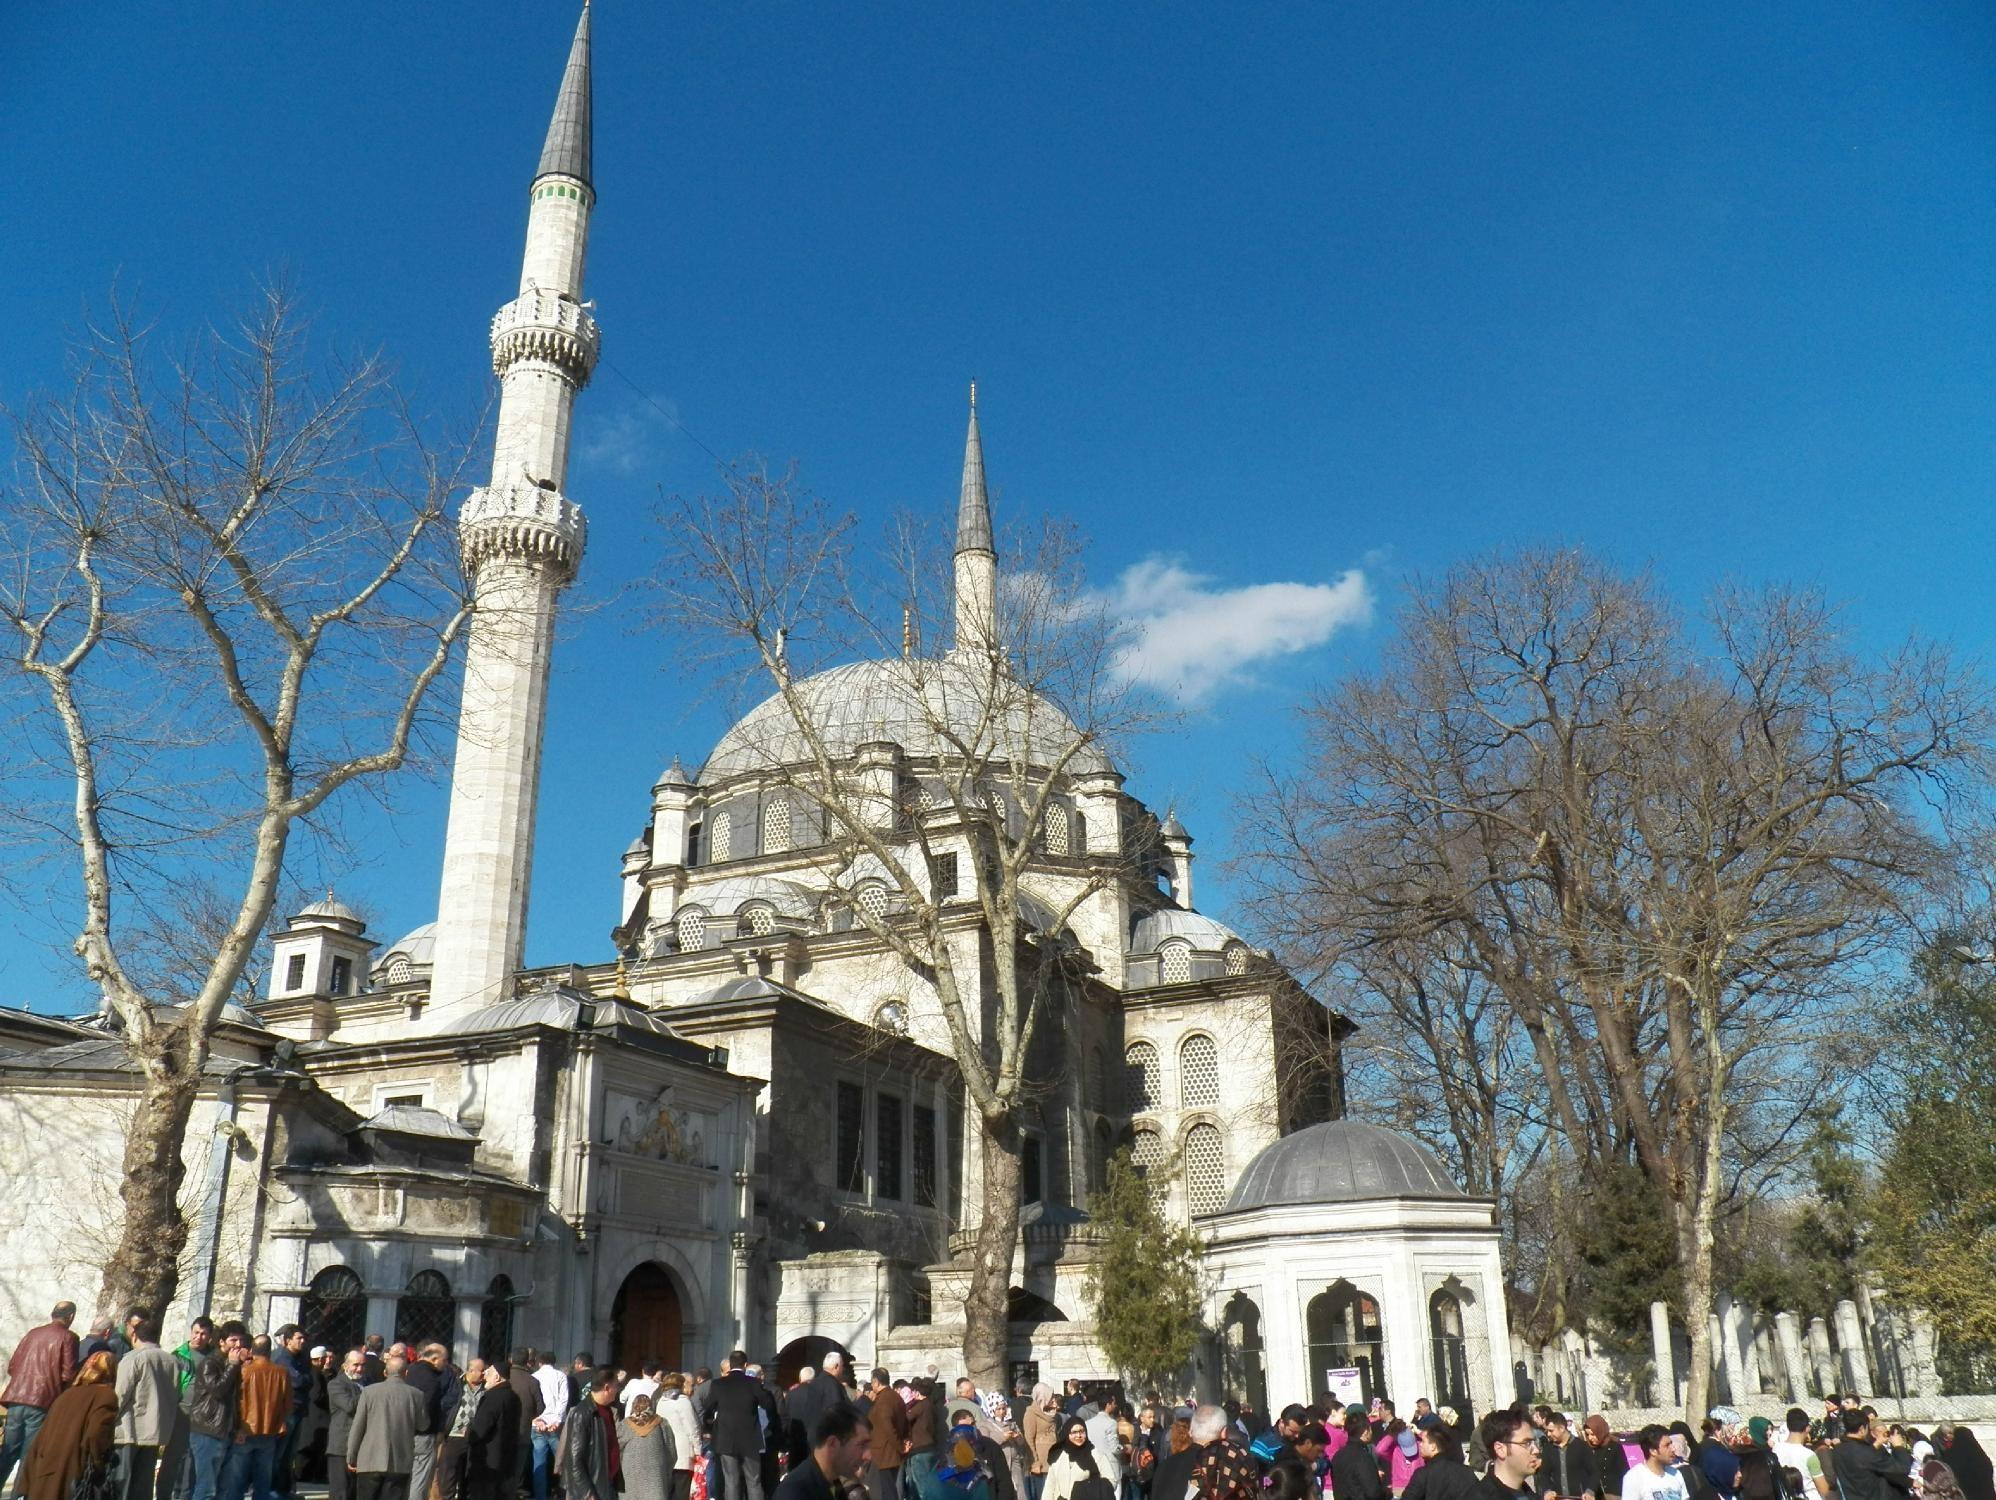 eyup-sultan-mosque-eyup-sultan-camii (1).jpg